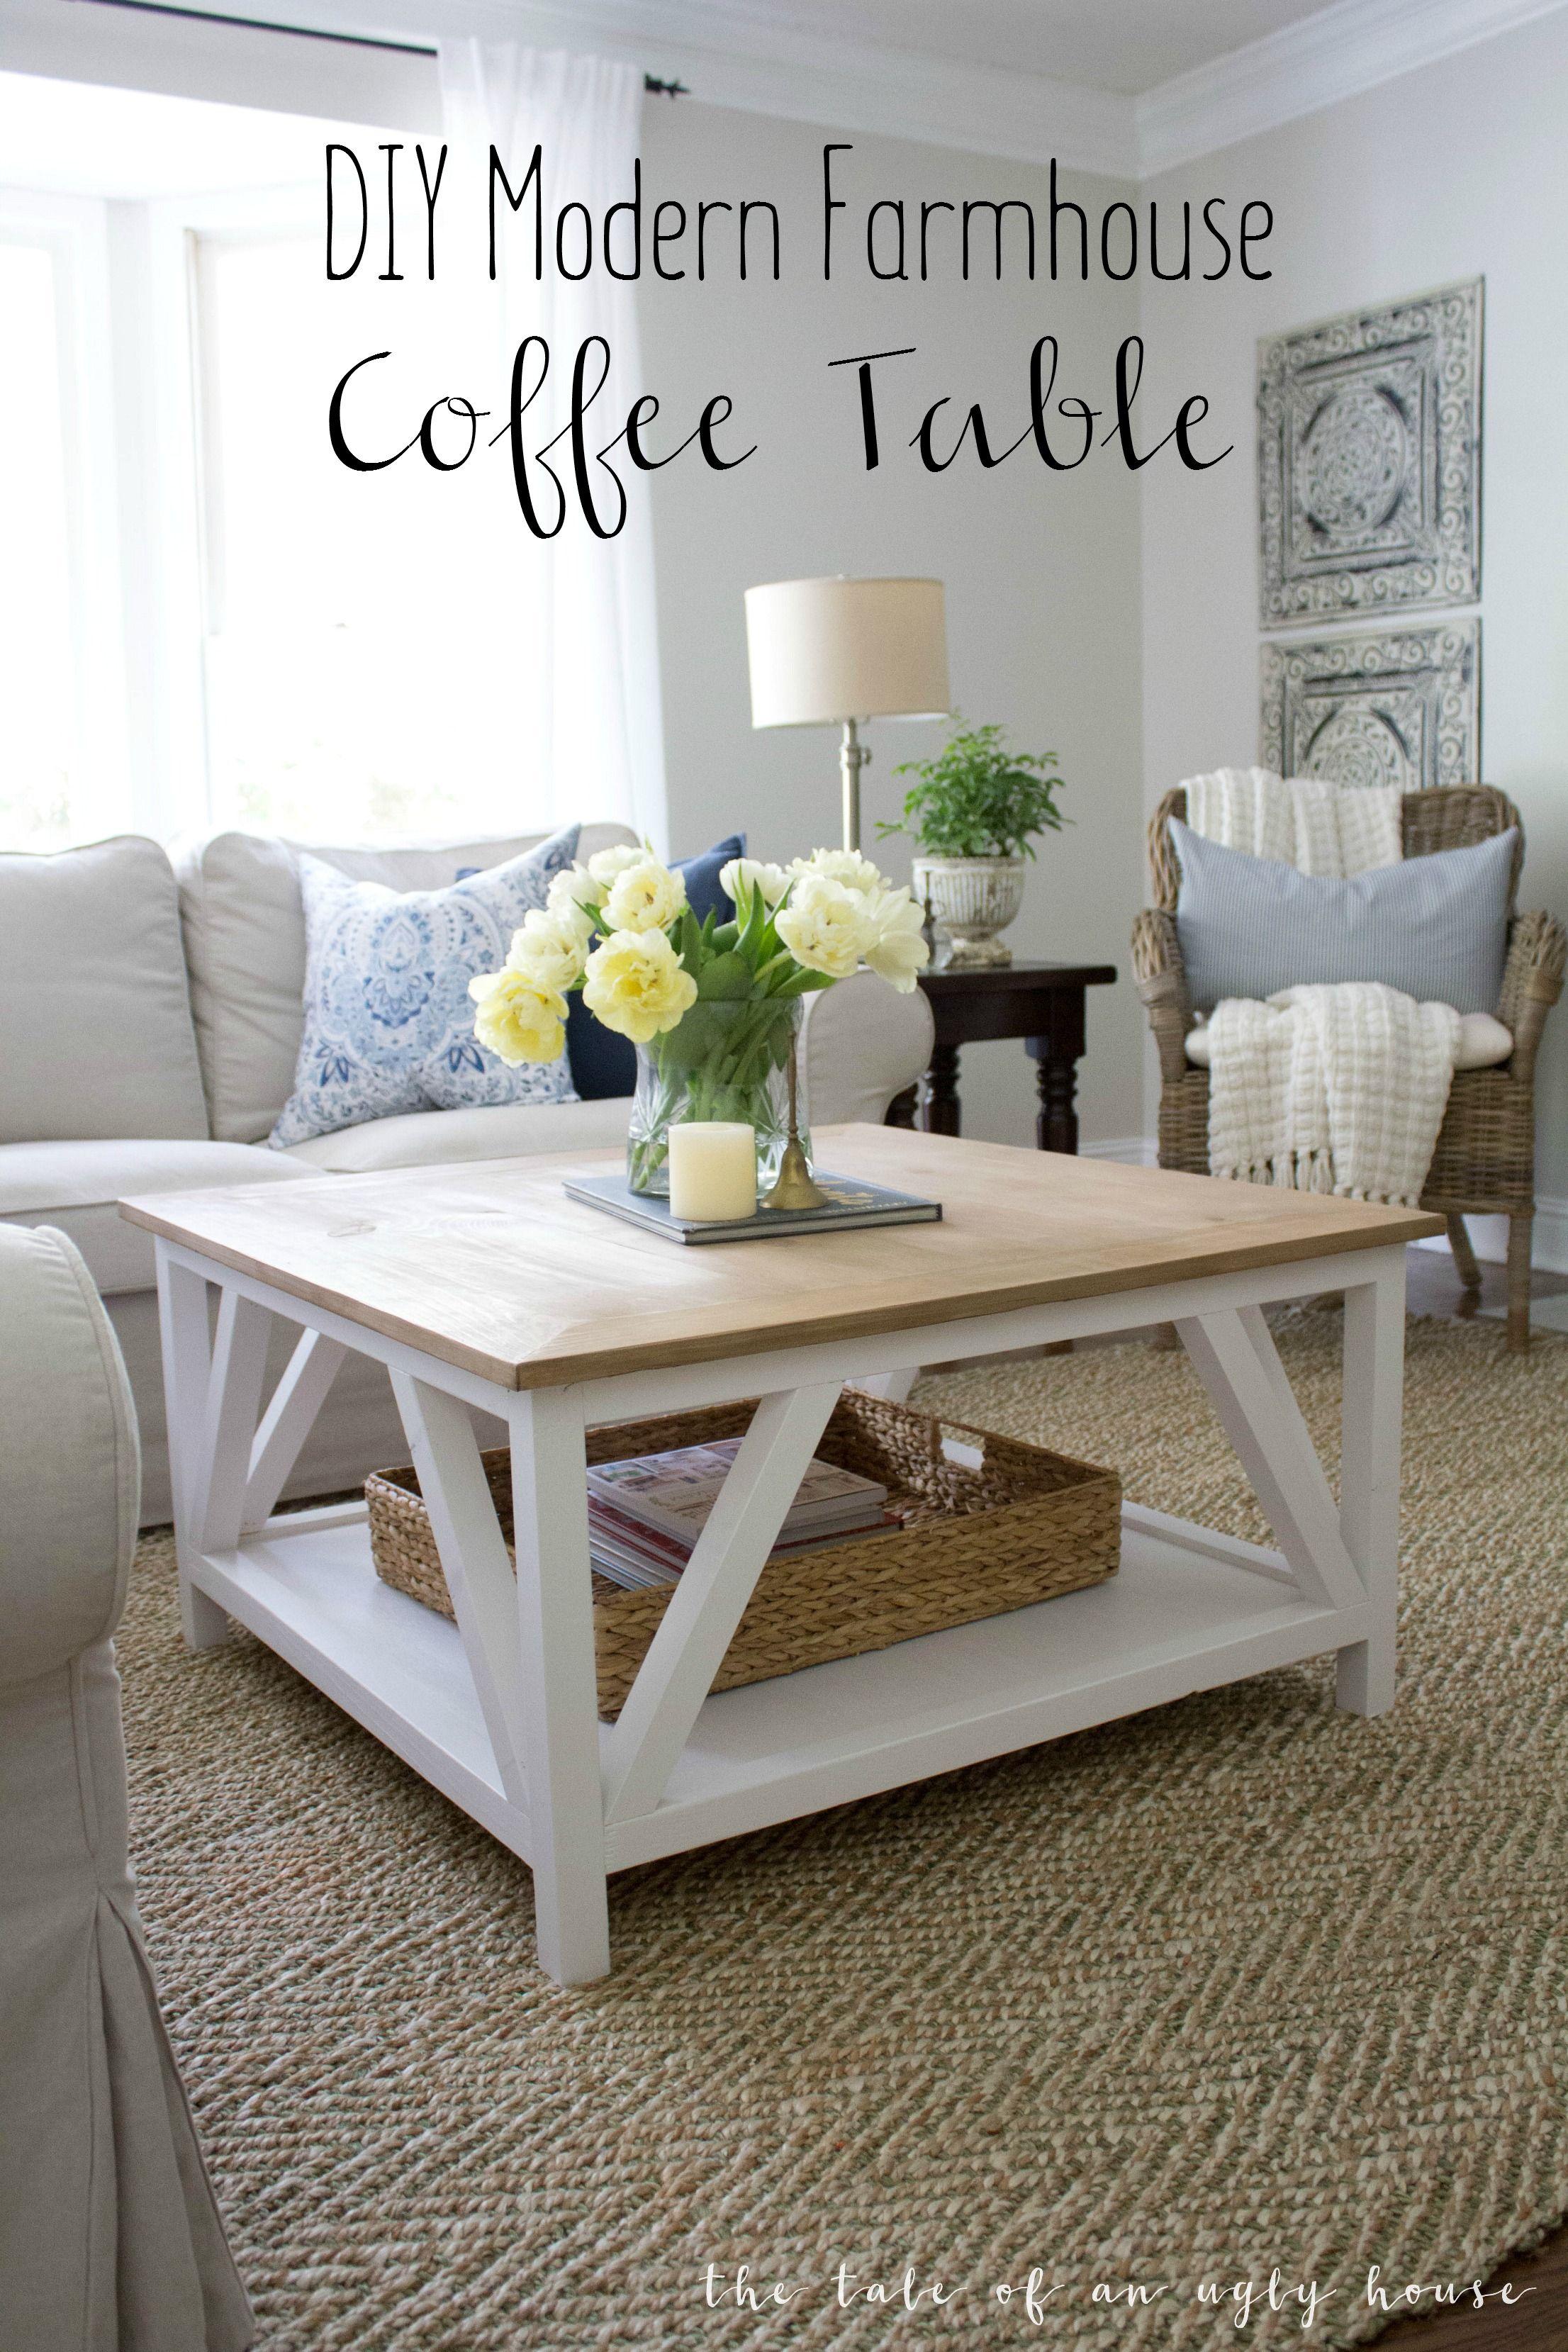 How to build a DIY Modern Farmhouse Coffee Table Classic